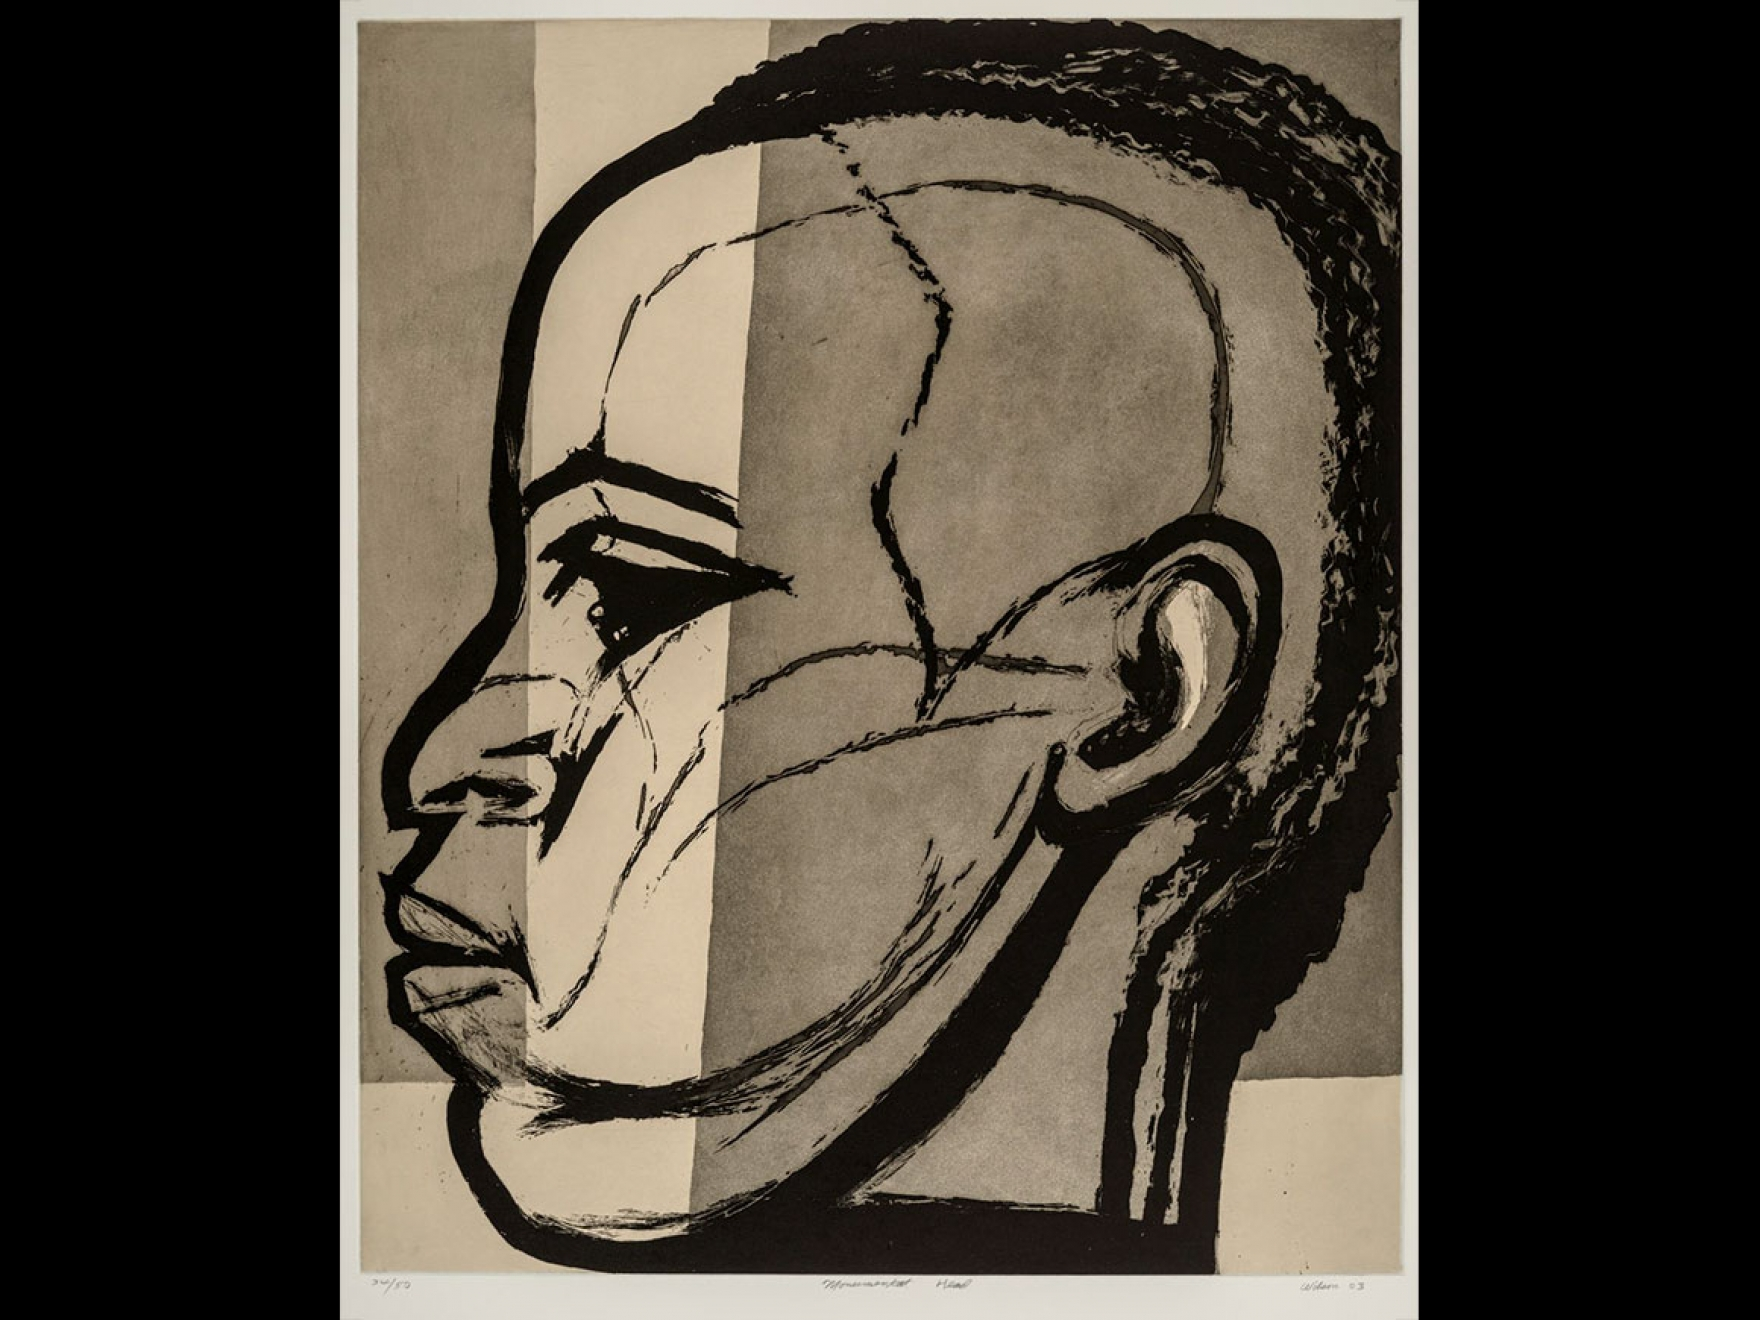 John Wilson's print, Monumental Head